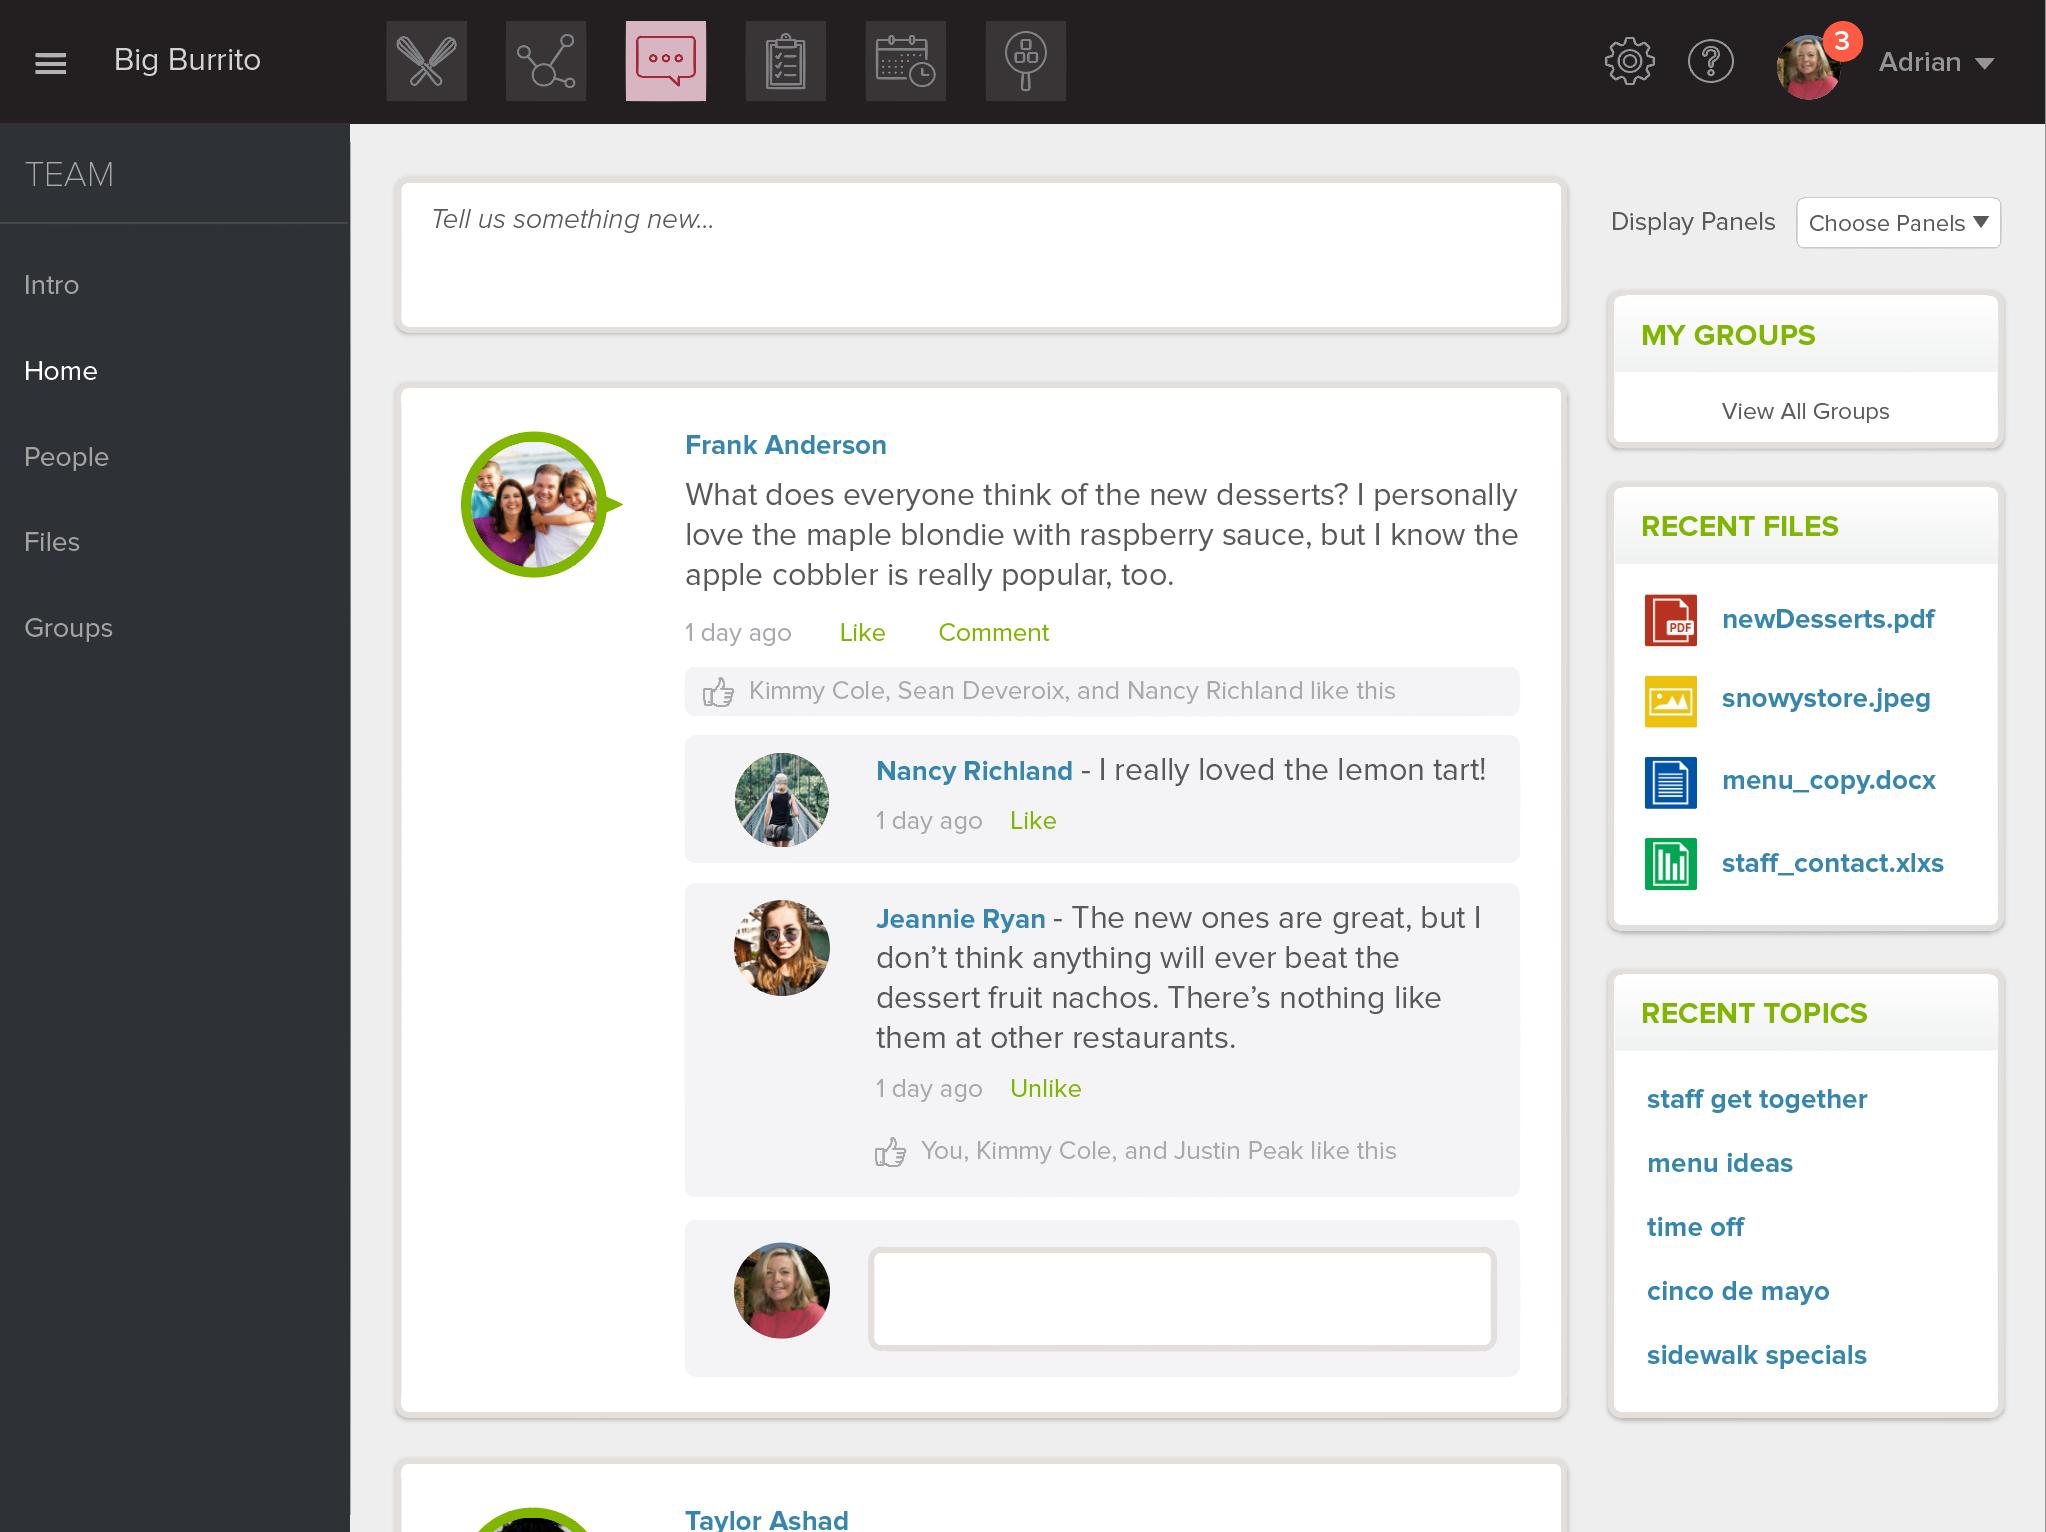 PeachWorks Software - Employee collaboration